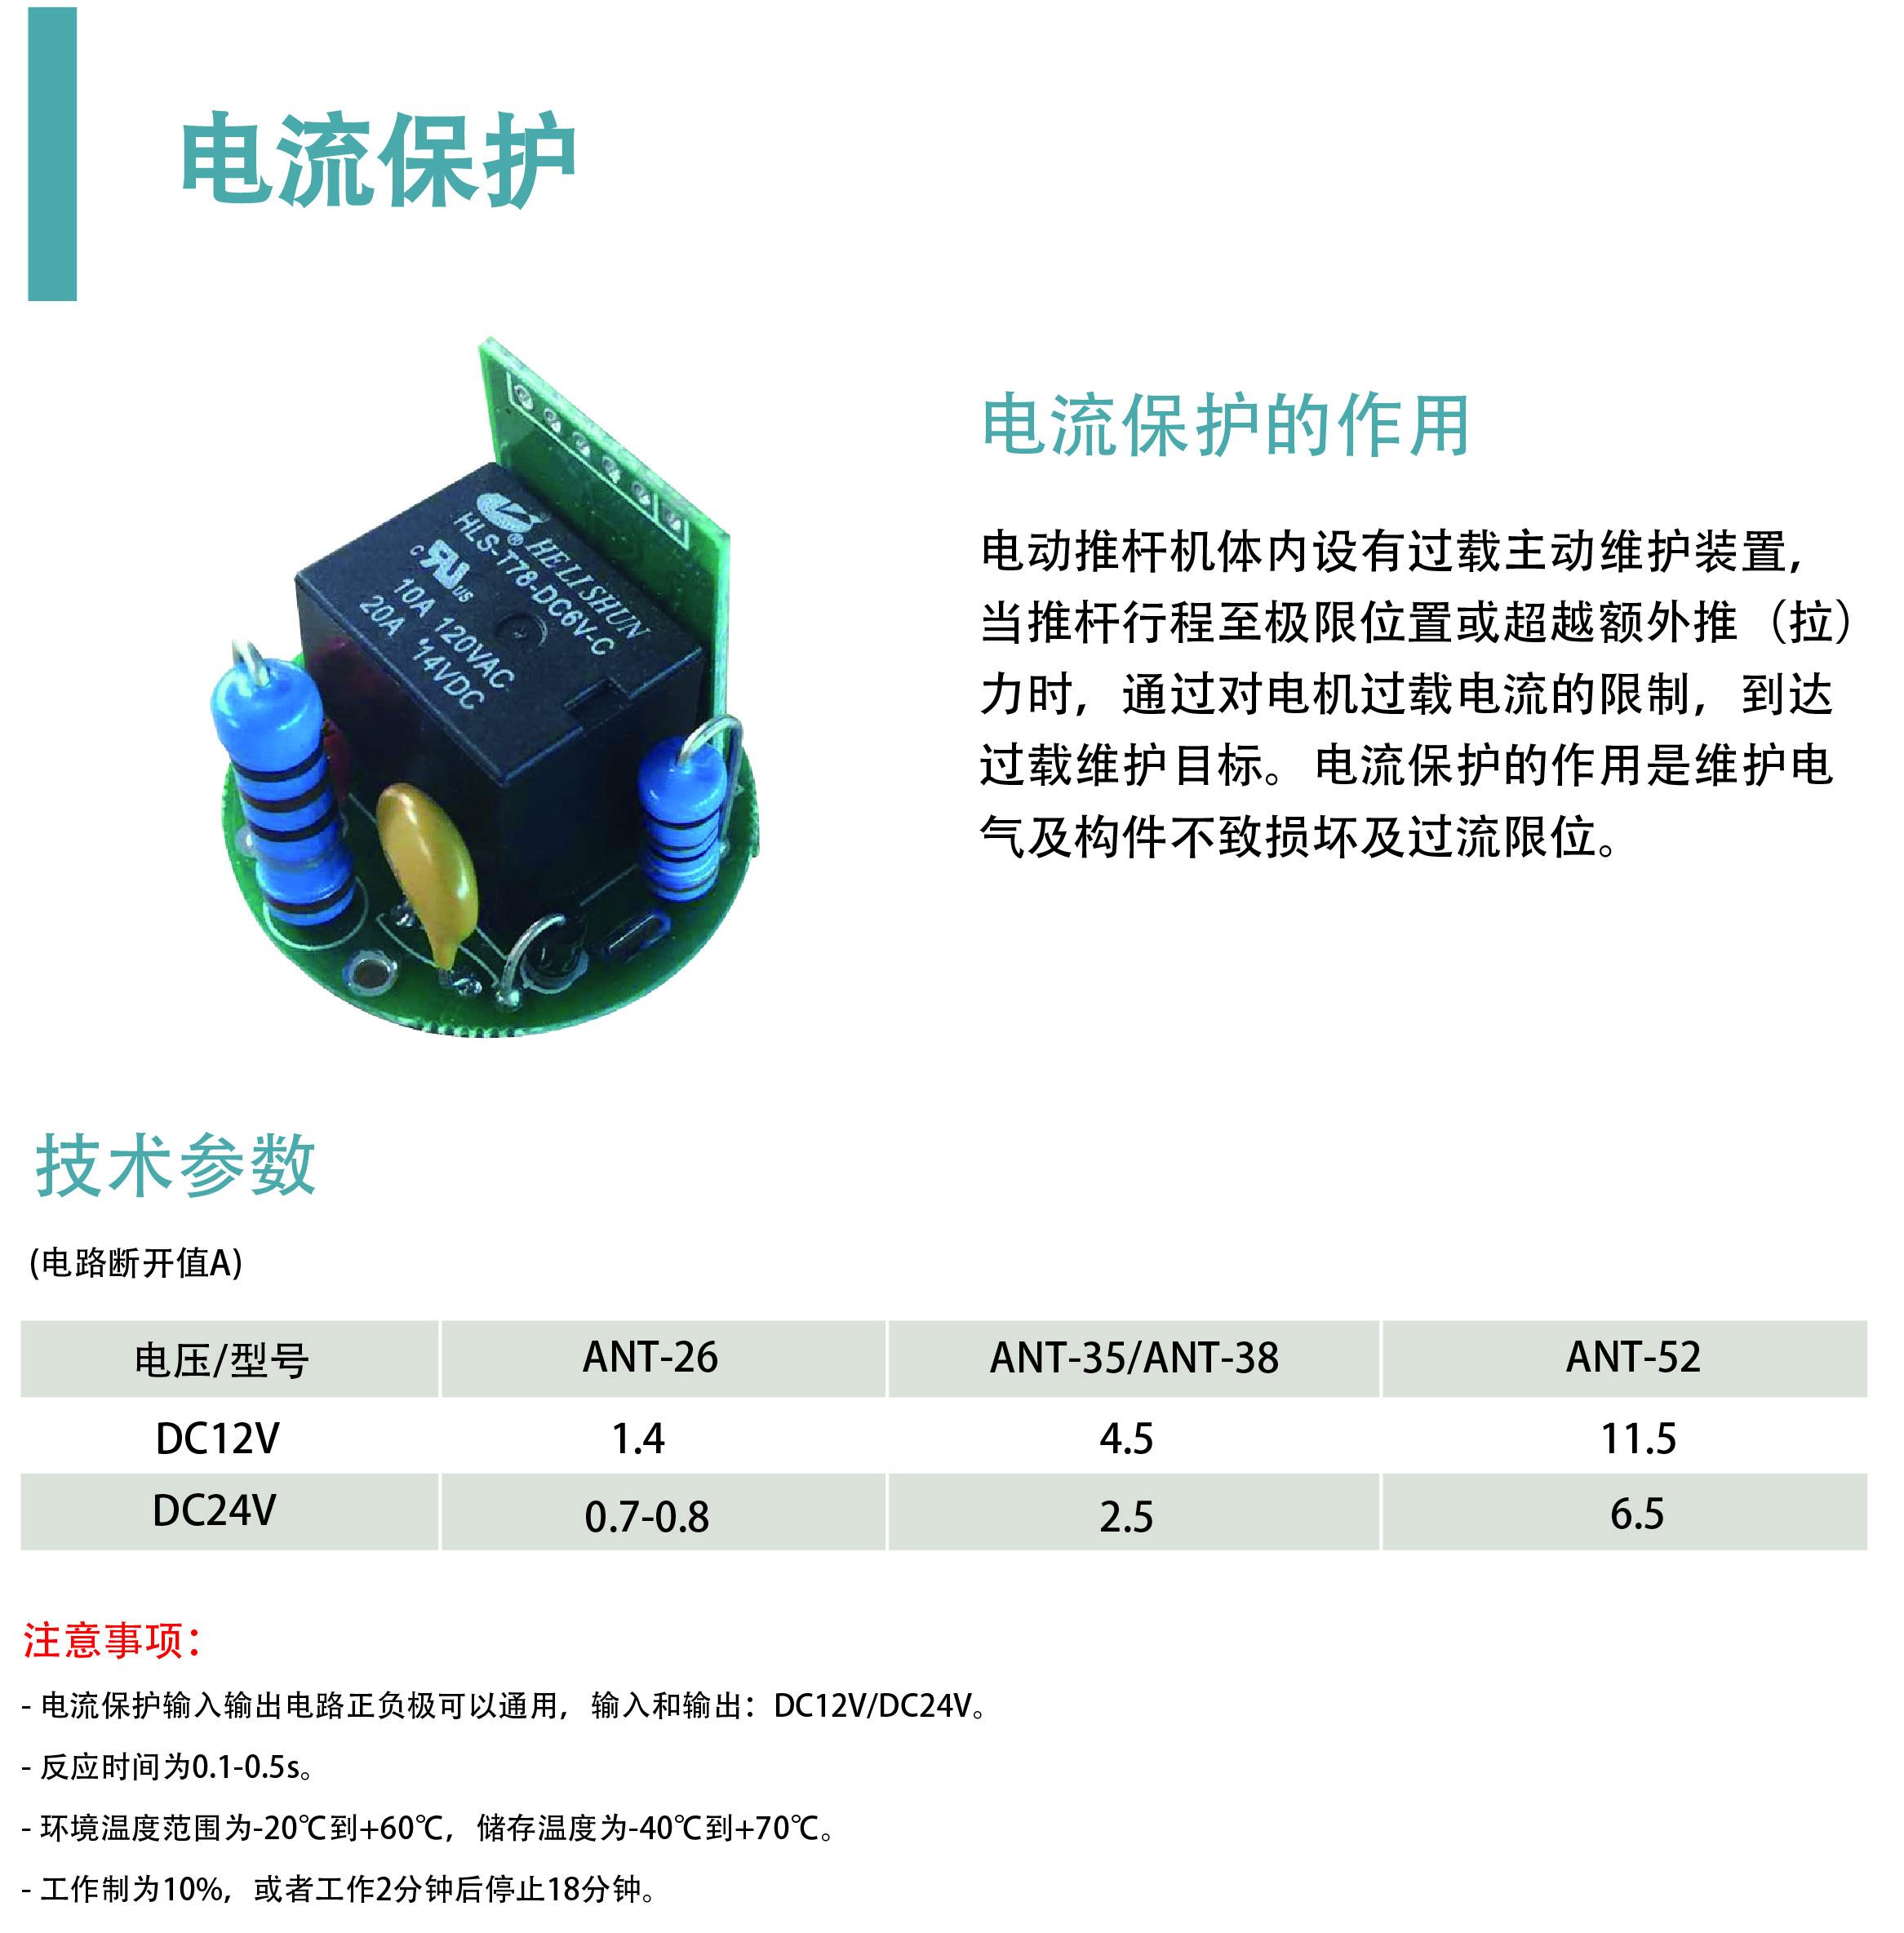 Brochure-2020 - 中文PDF-13.jpg